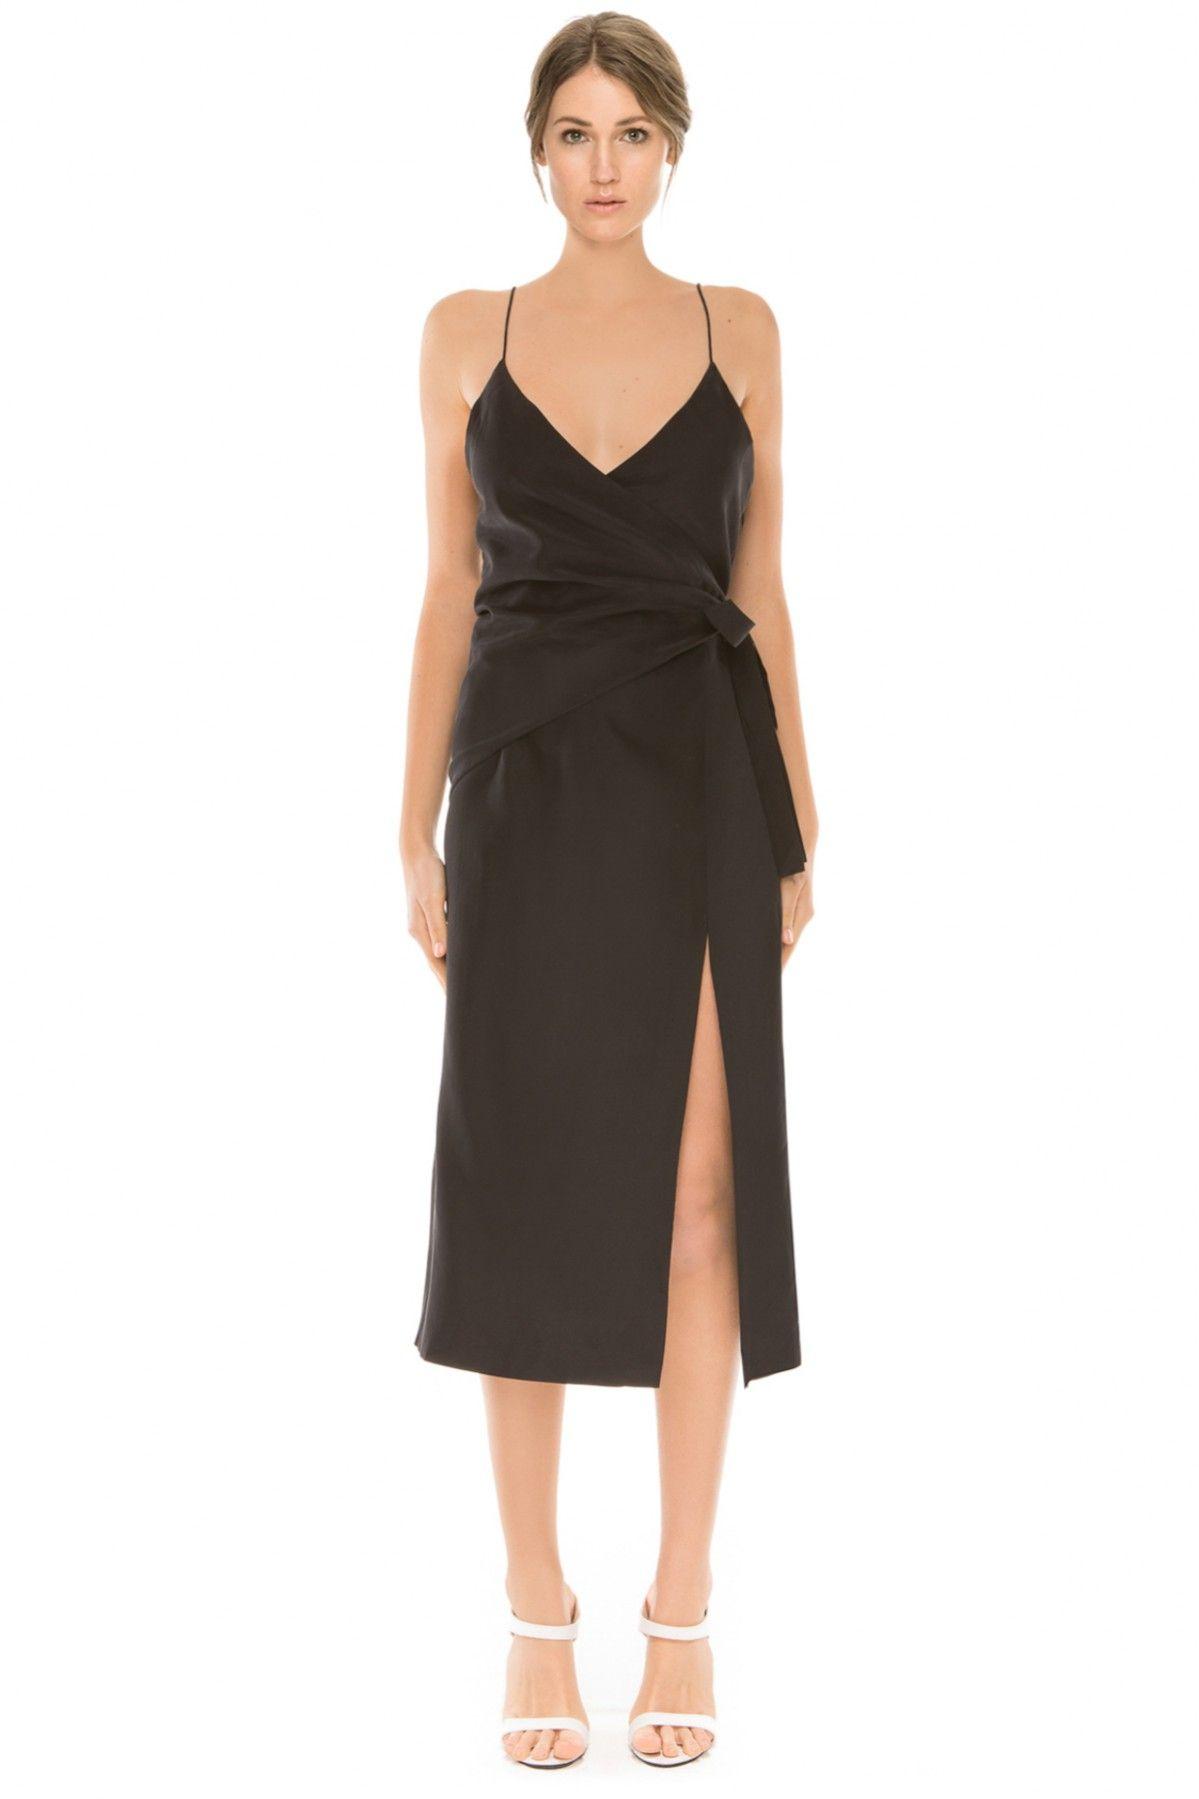 C/MEO COLLECTIVE DON'T WAIT SILK DRESS BLACK - BNKR